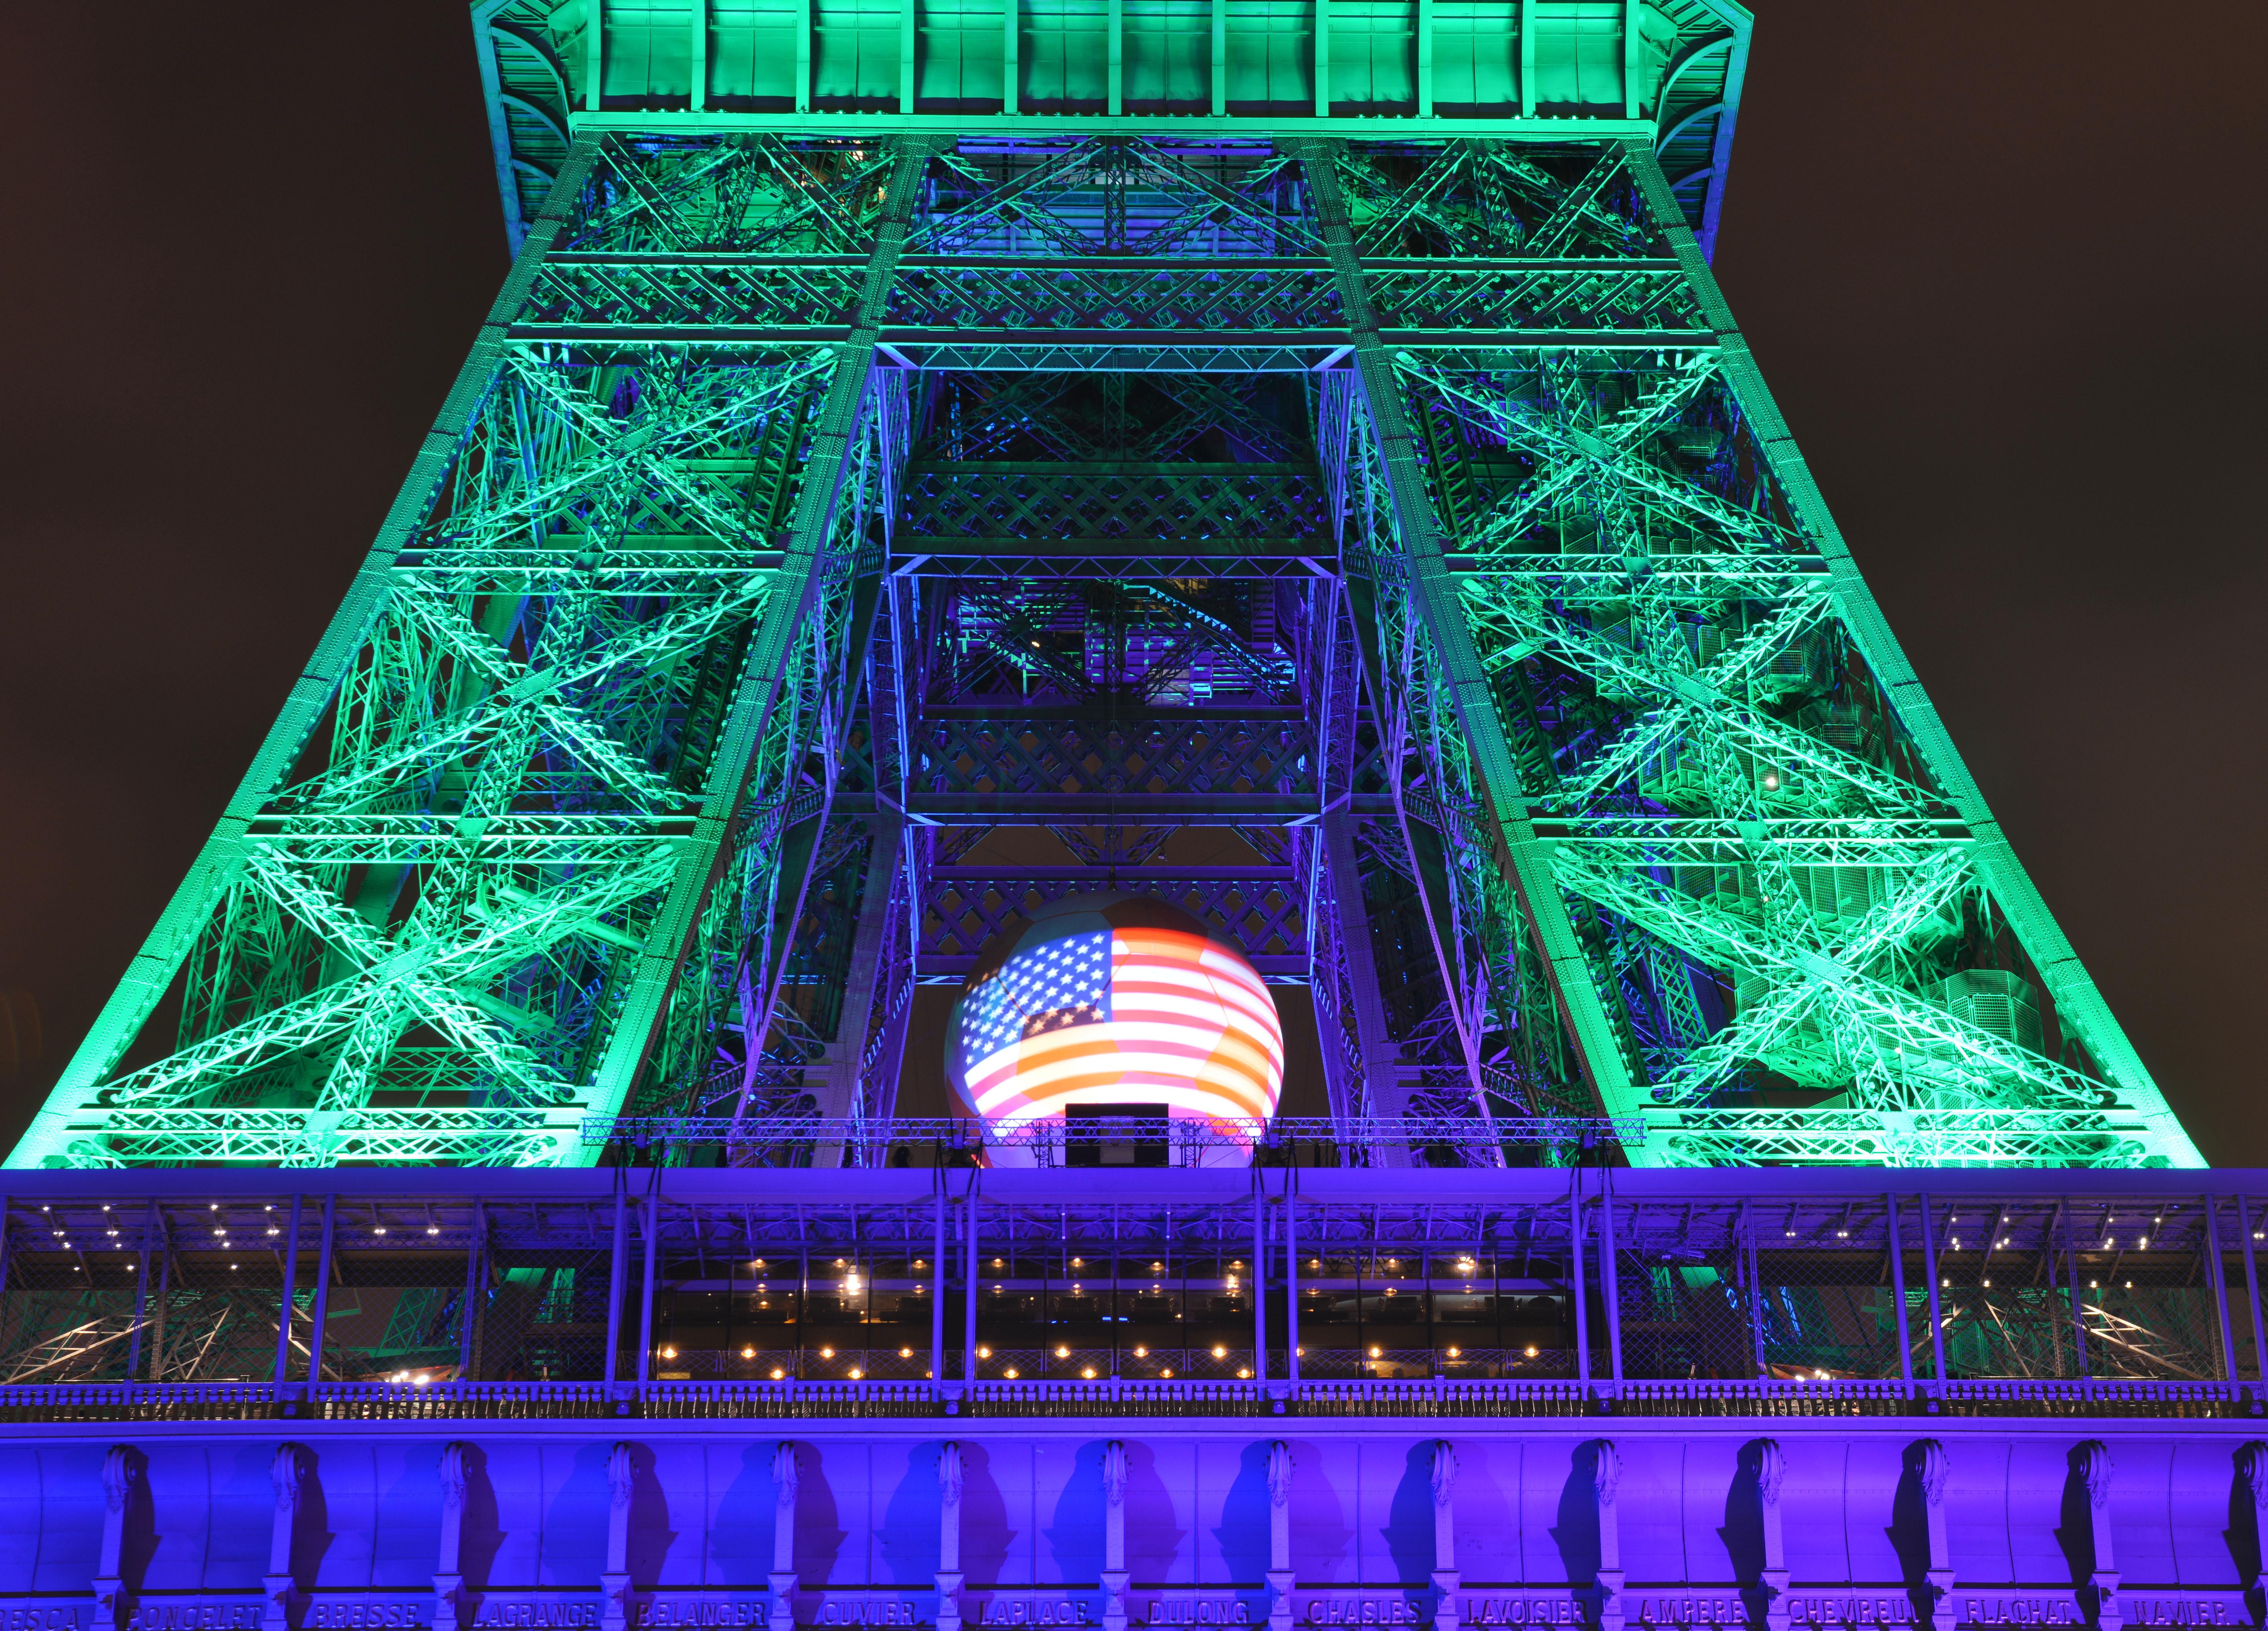 La Torre Eiffel se ilumina de colores de LGBT